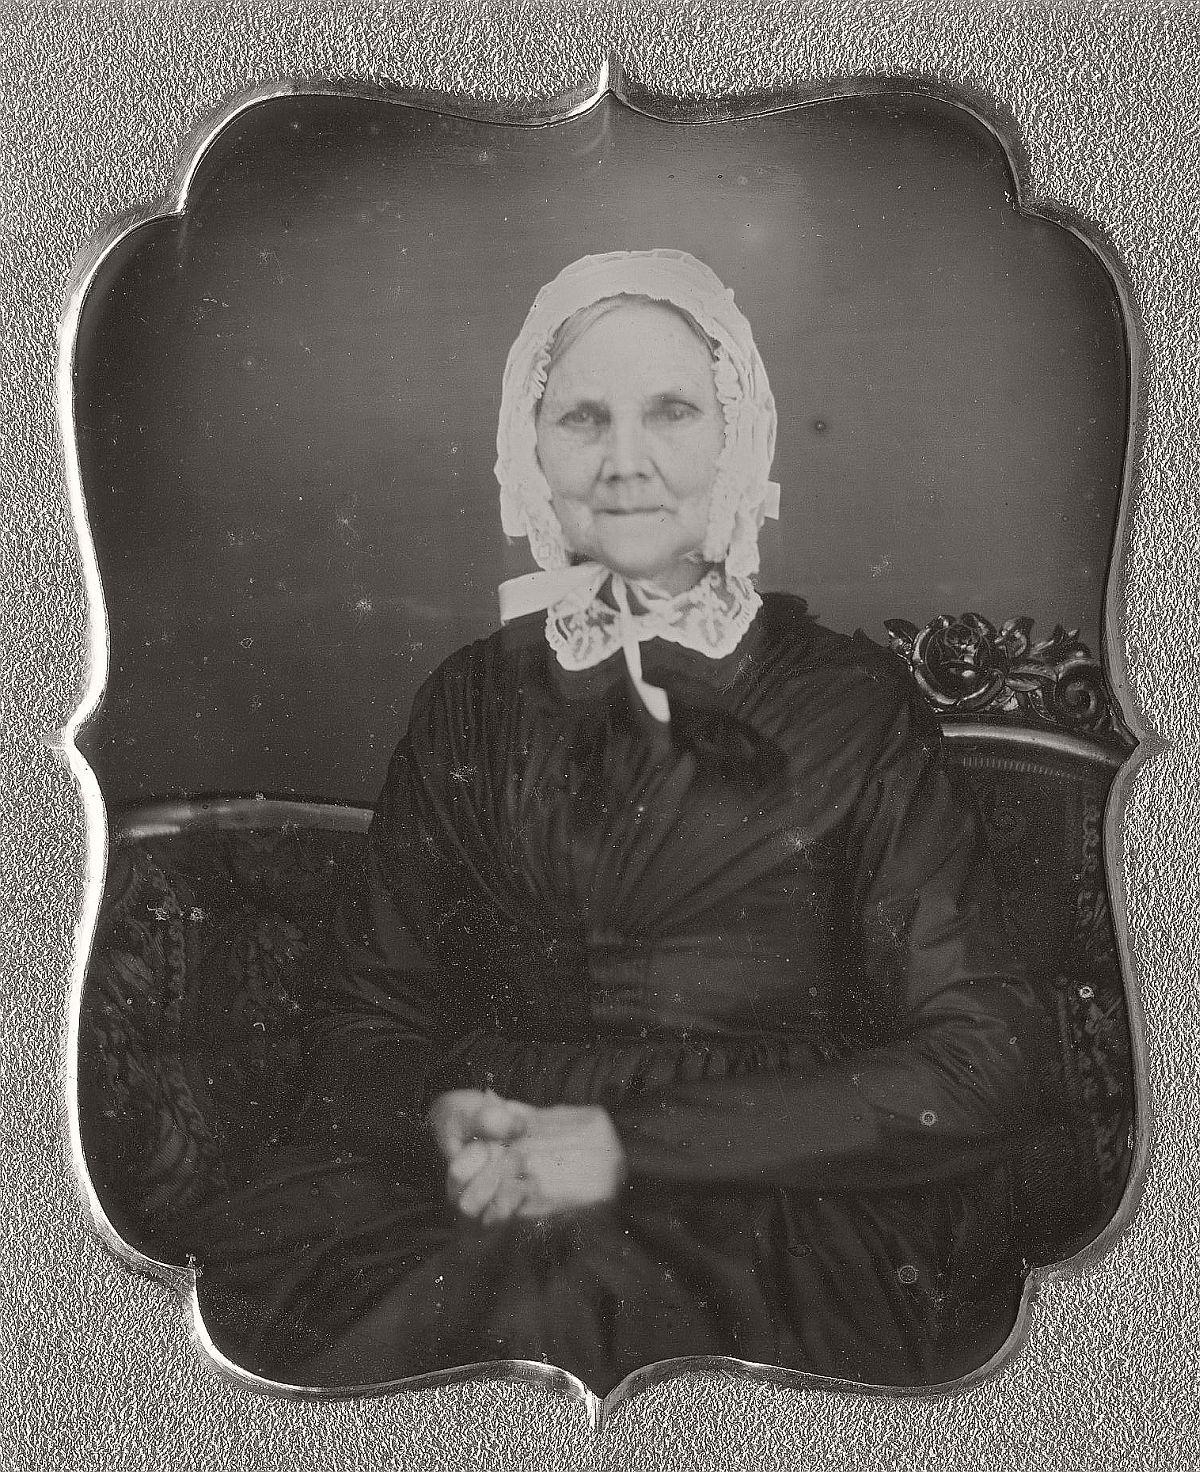 daguerreotype-portrait-ladies-born-in-the-late-18th-century-1700s-vintage-21